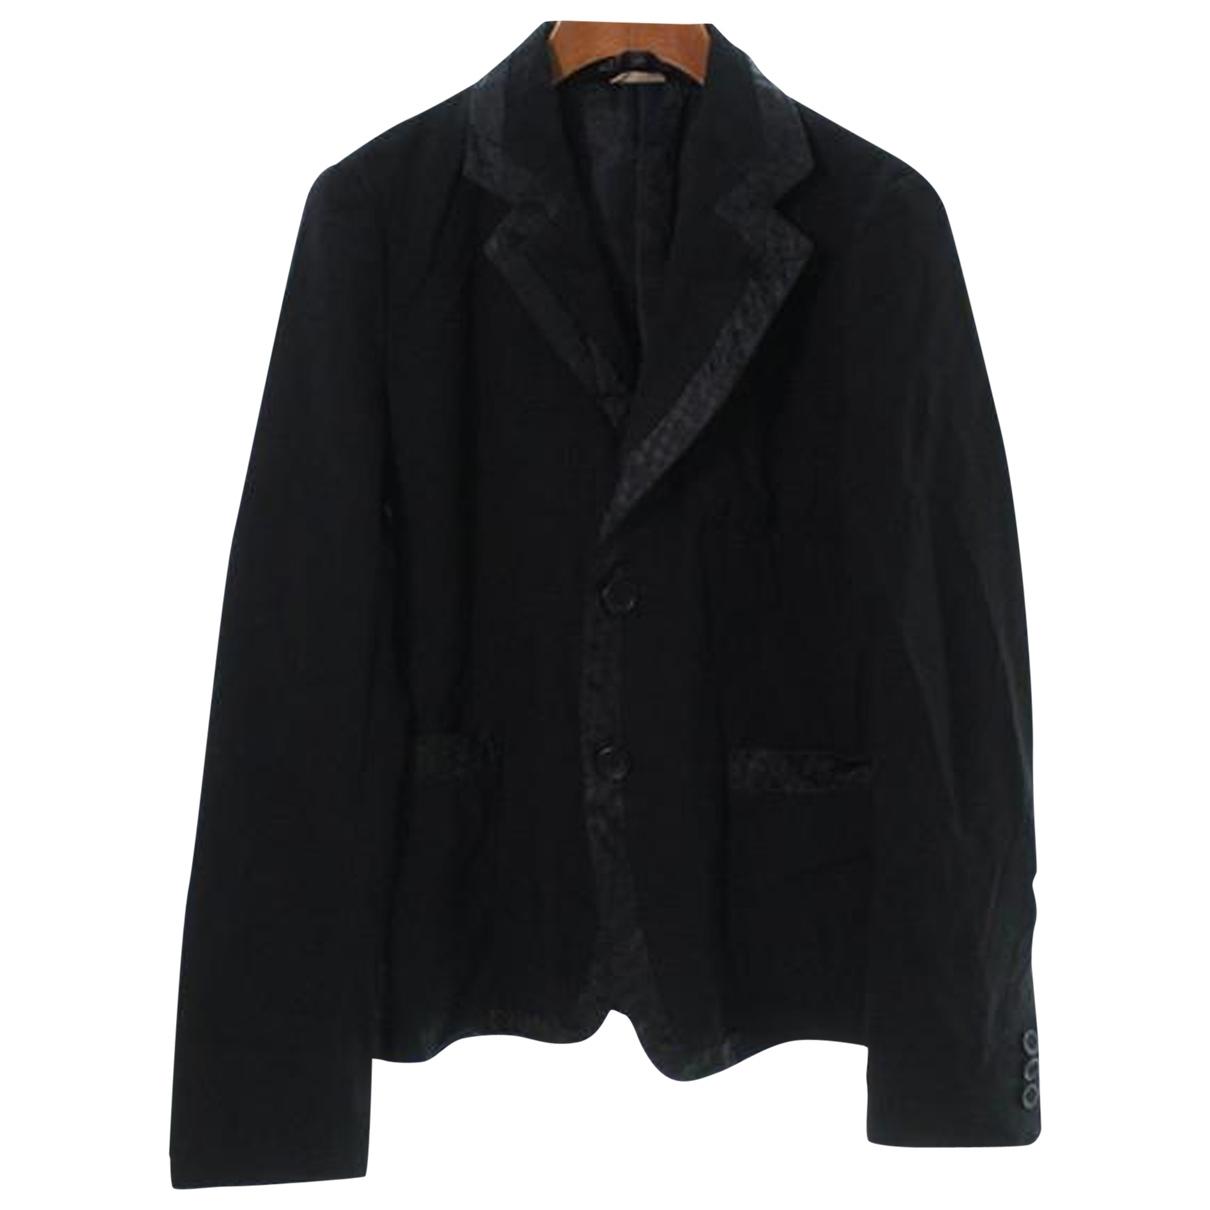 Comme Des Garcons \N Black jacket for Women XS International